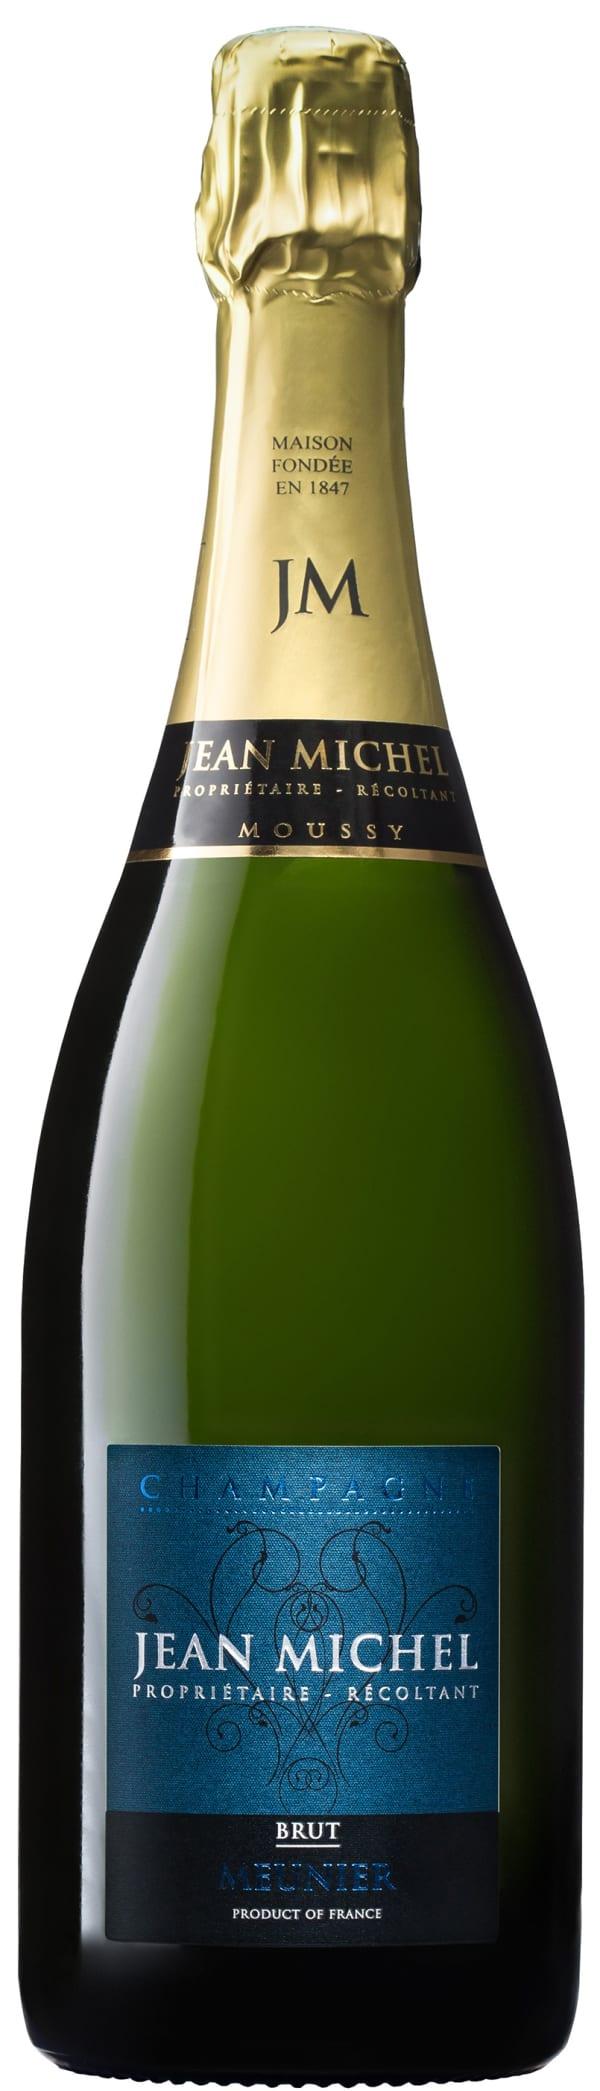 Jean Michel Meunier Champagne Brut 2014